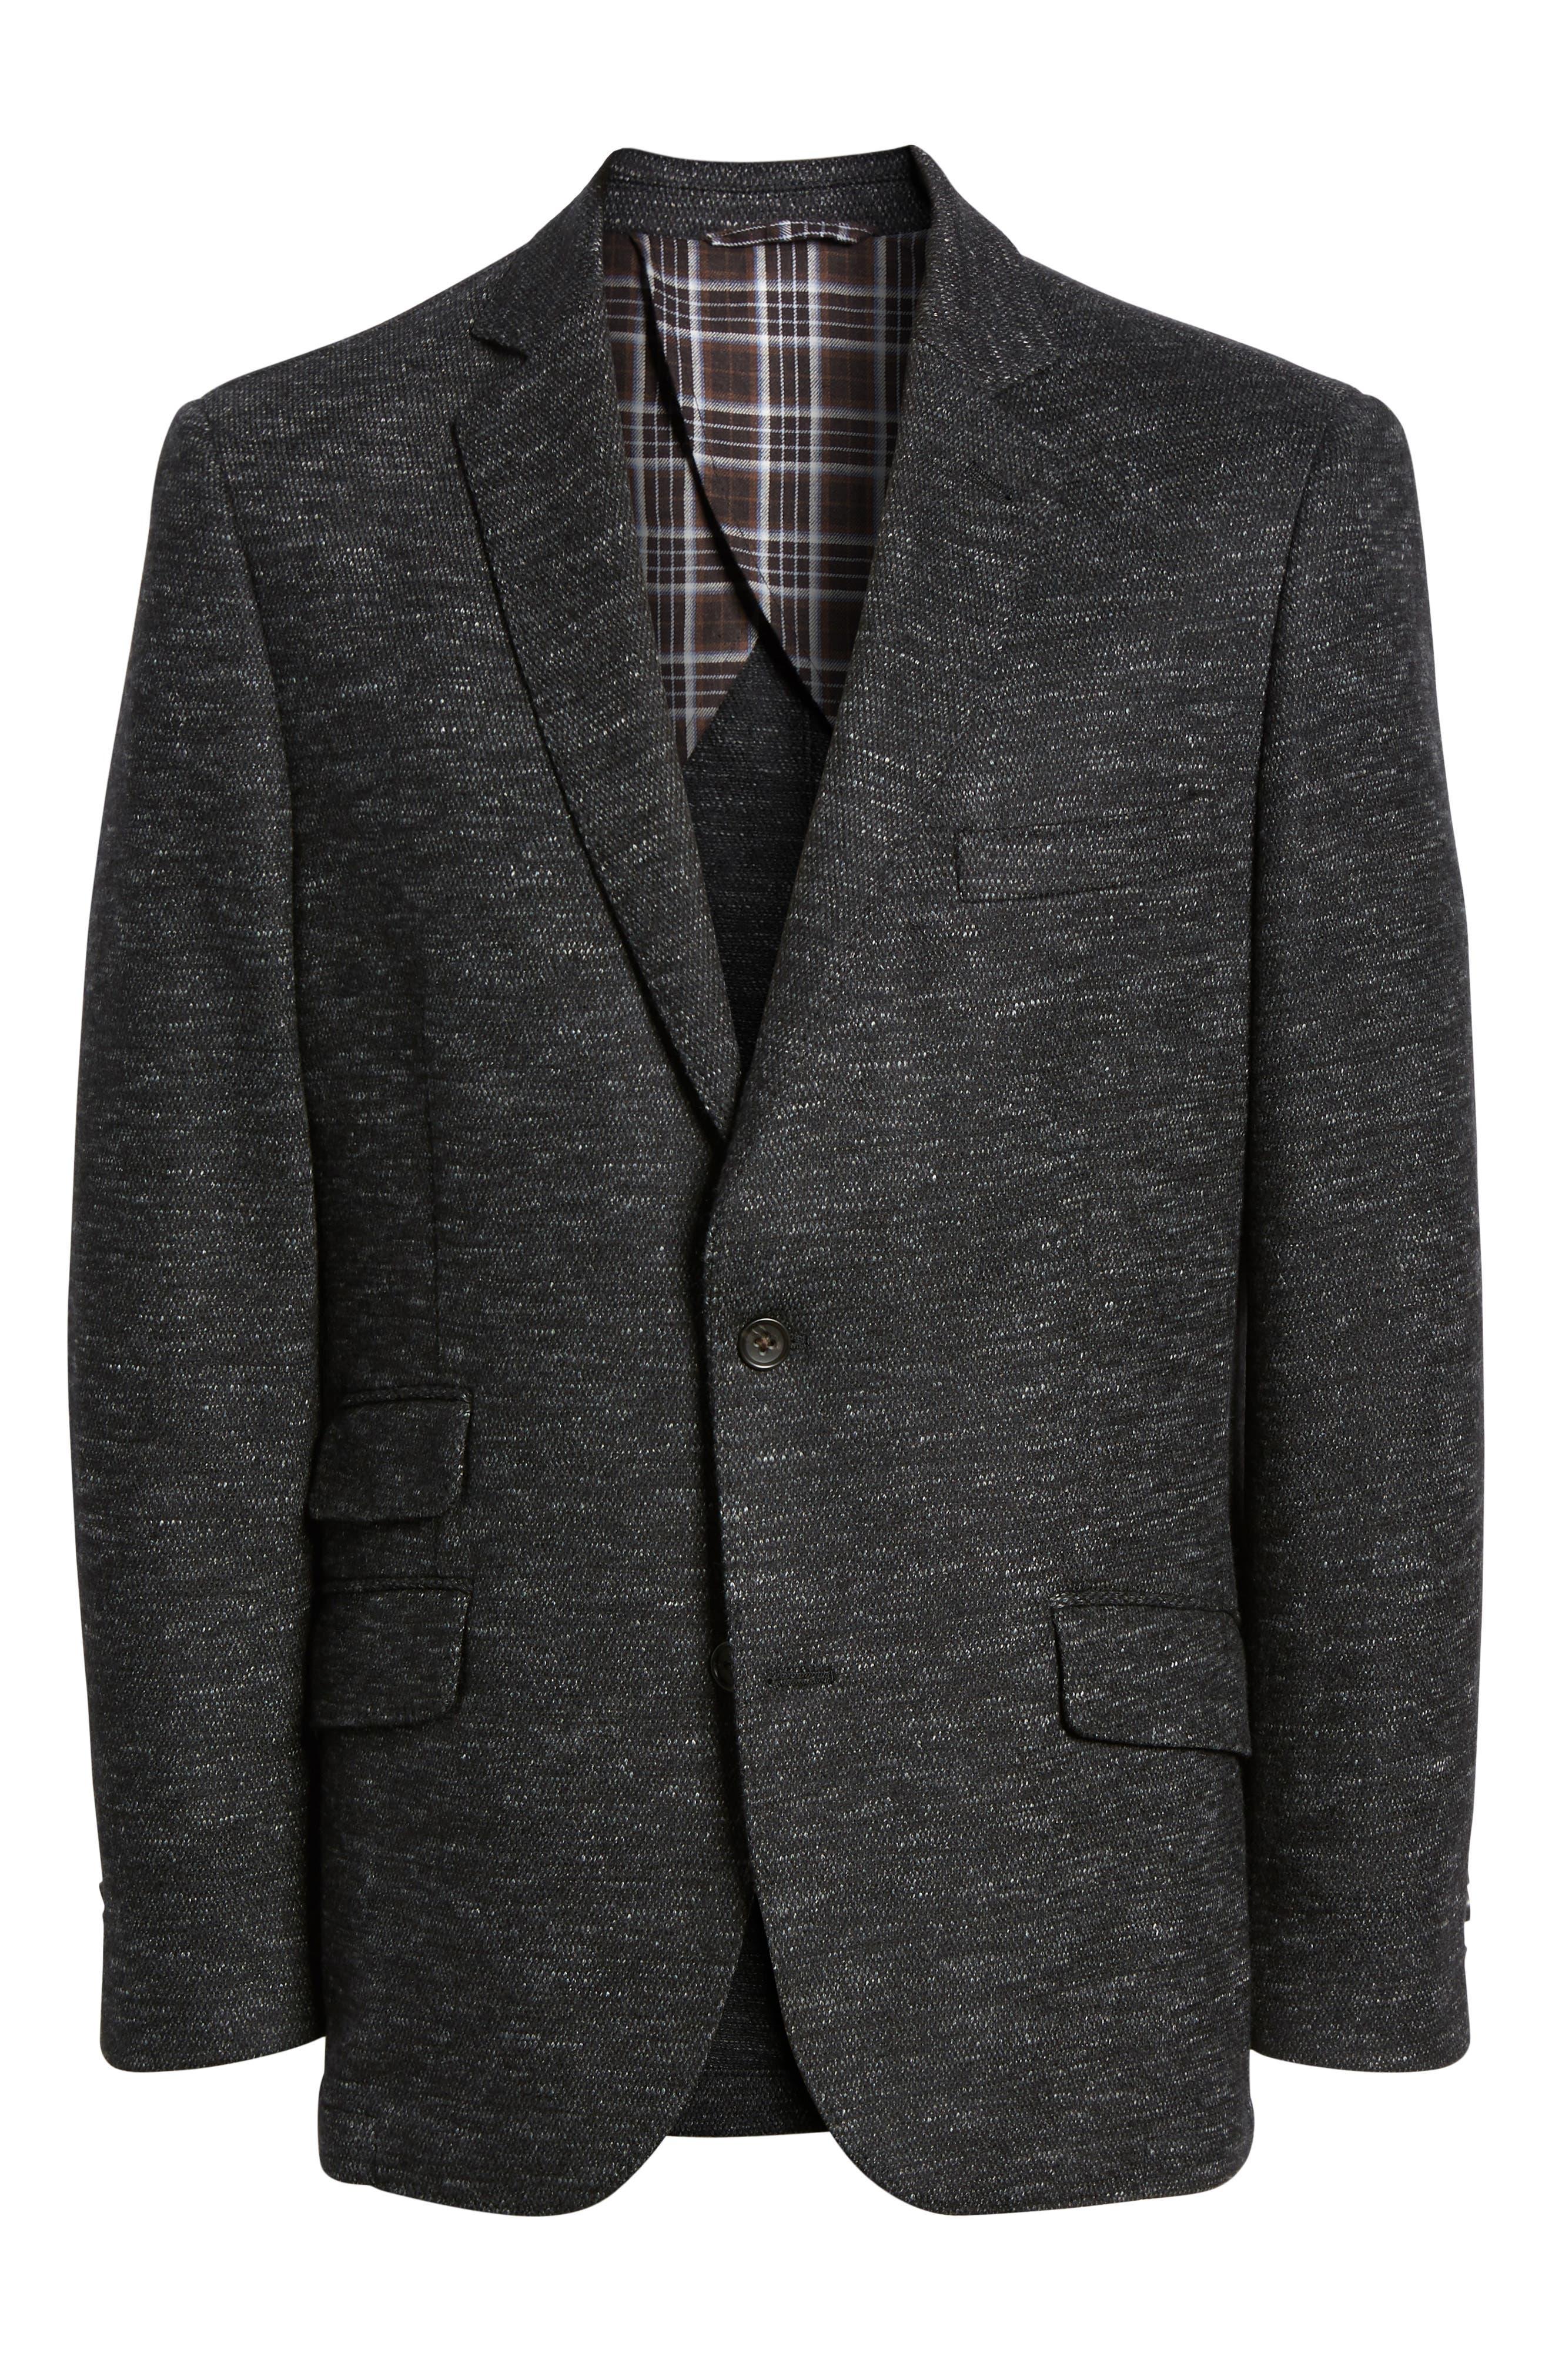 Regular Fit Knit Wool Blend Sport Coat,                             Alternate thumbnail 5, color,                             CHARCOAL